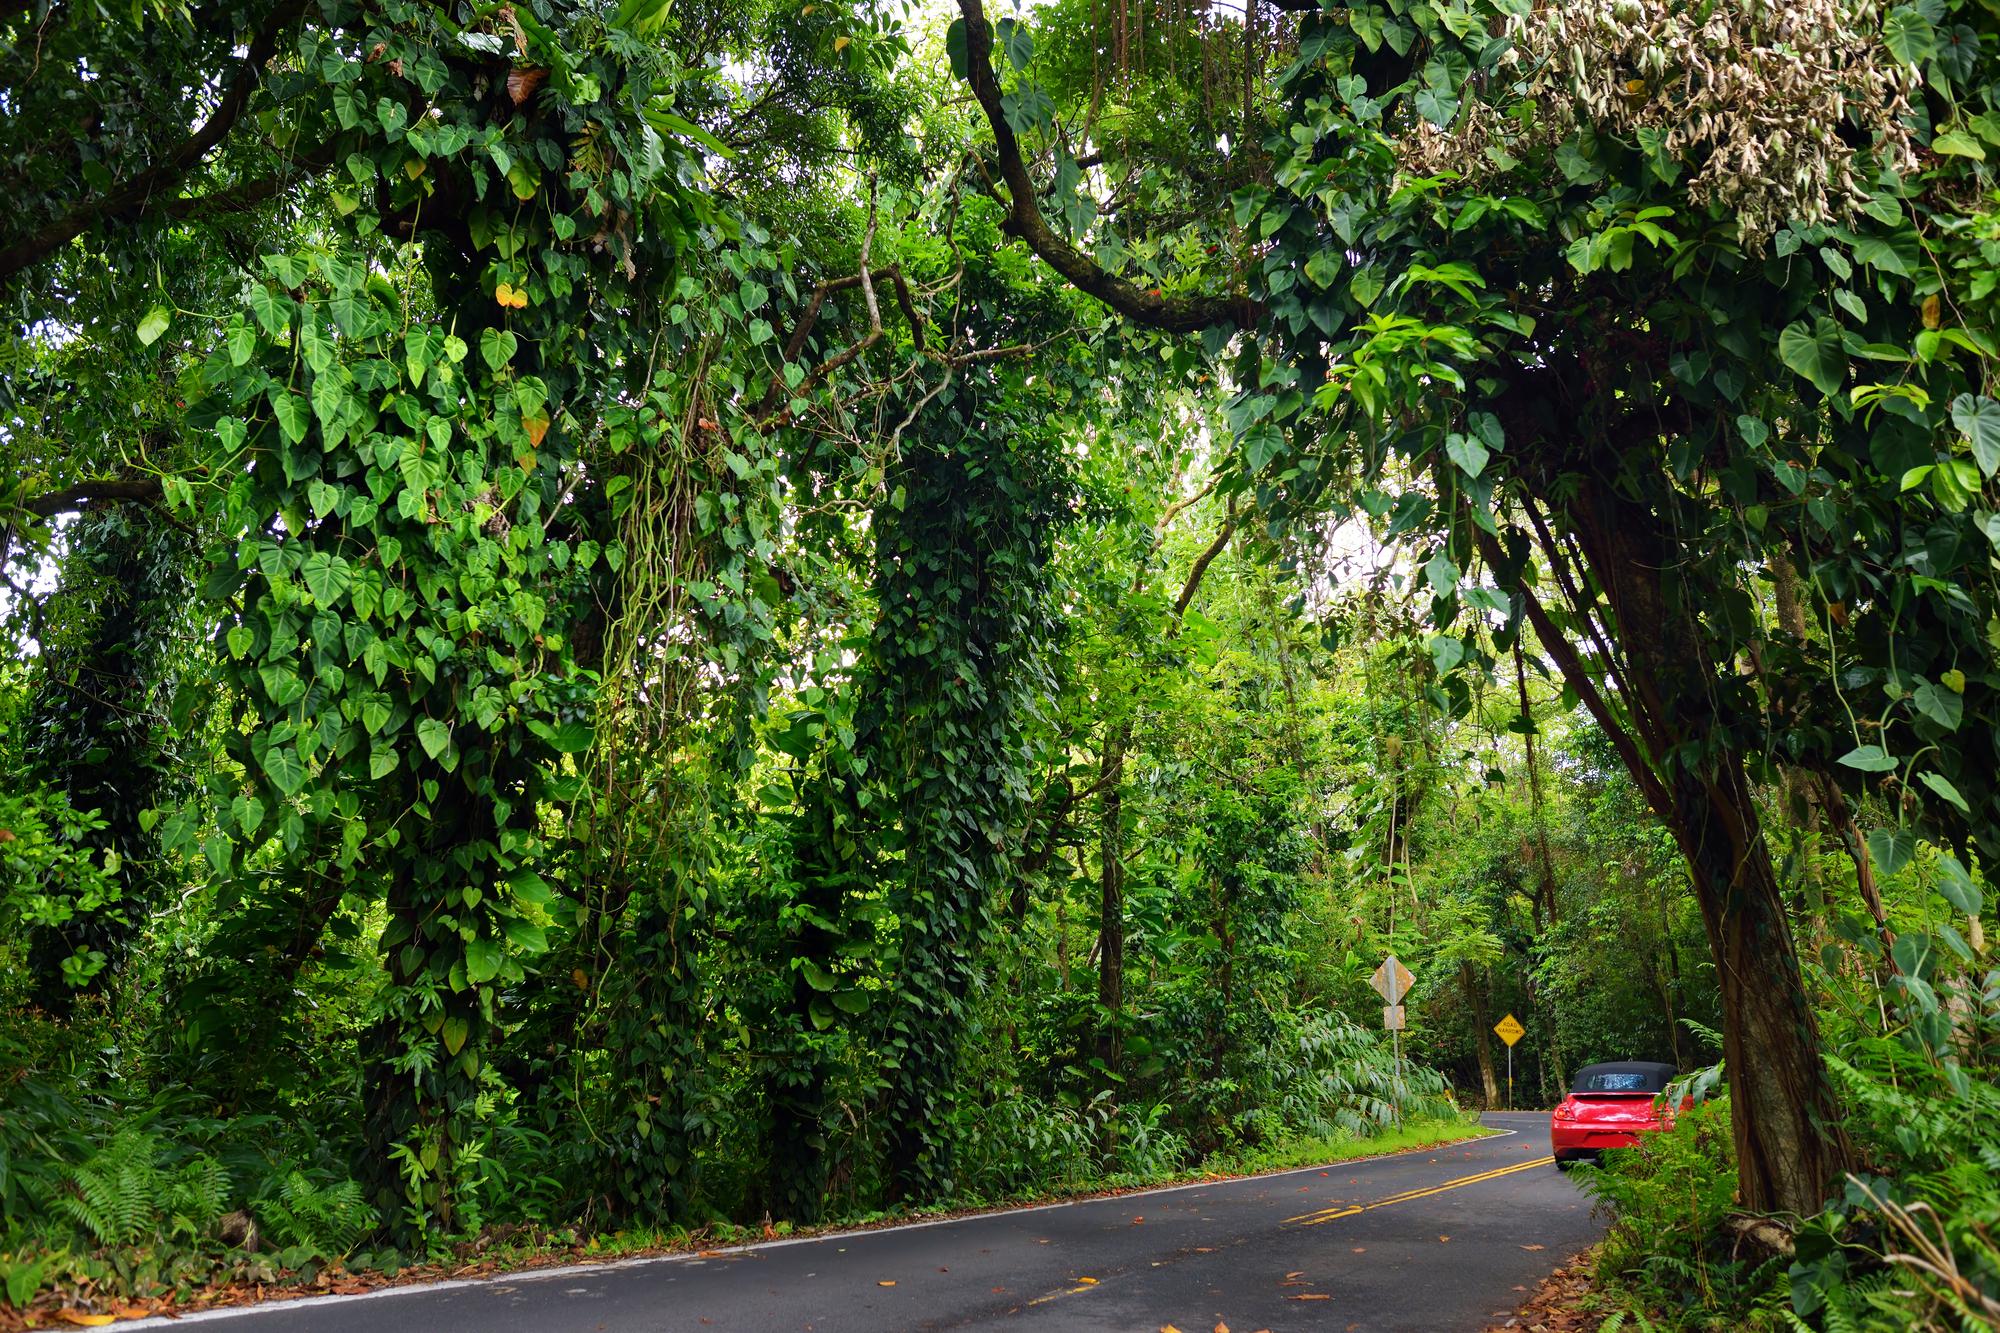 Hana Highway road